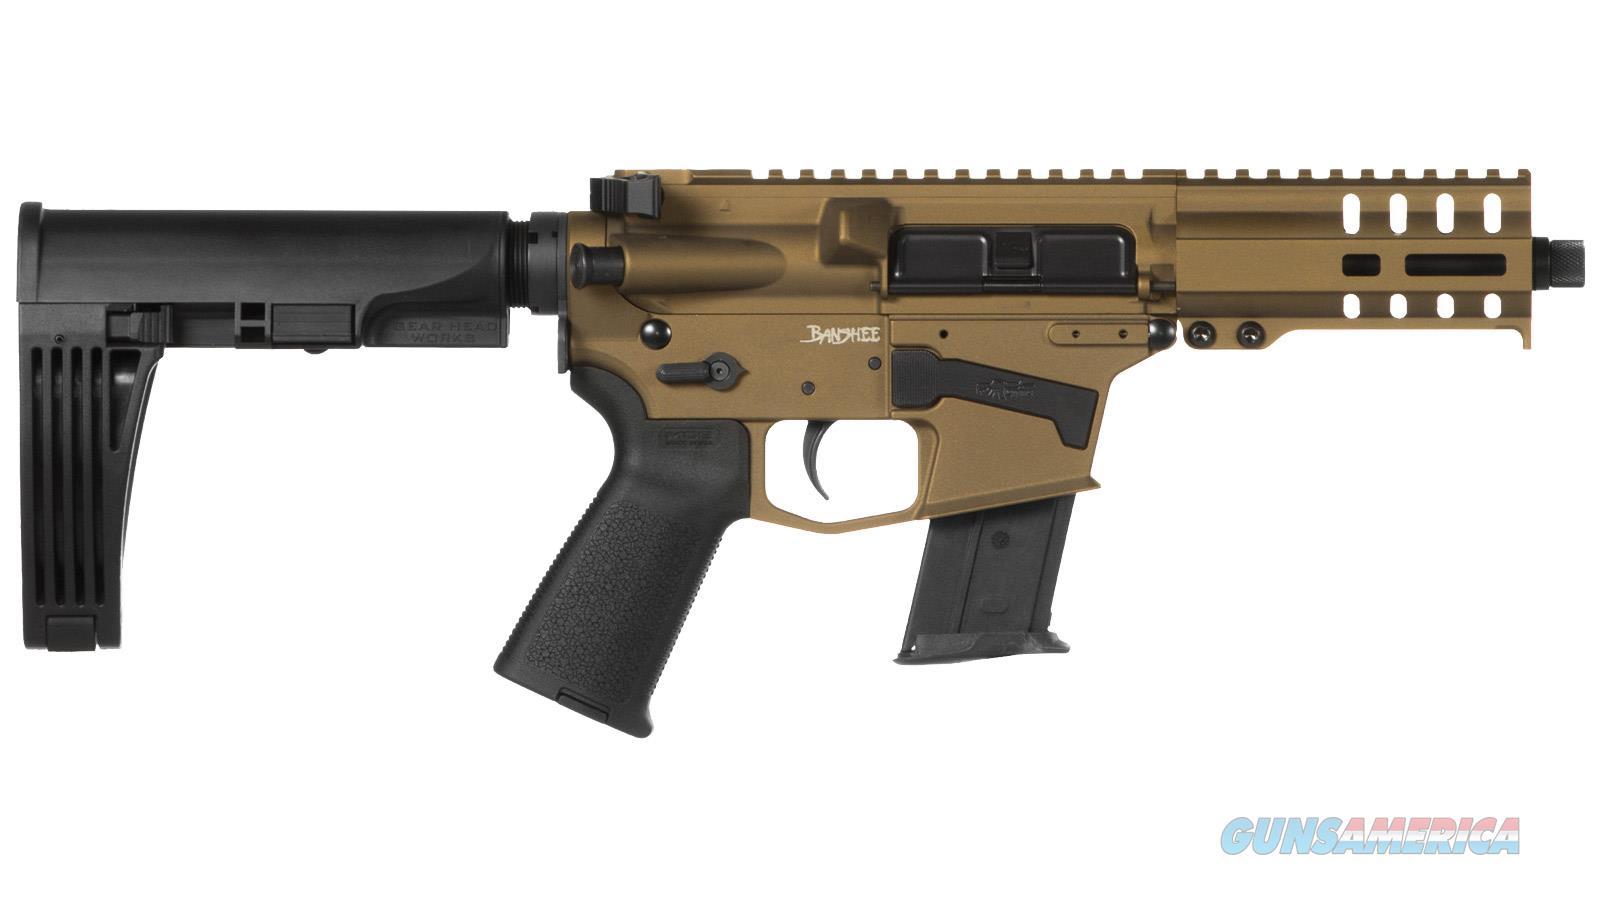 "Cmmg Banshee Pistol 5.7X28mm 5"" 20Rd Bur. Bronze Mlok Brace 57A18CD-BB  Guns > Pistols > C Misc Pistols"